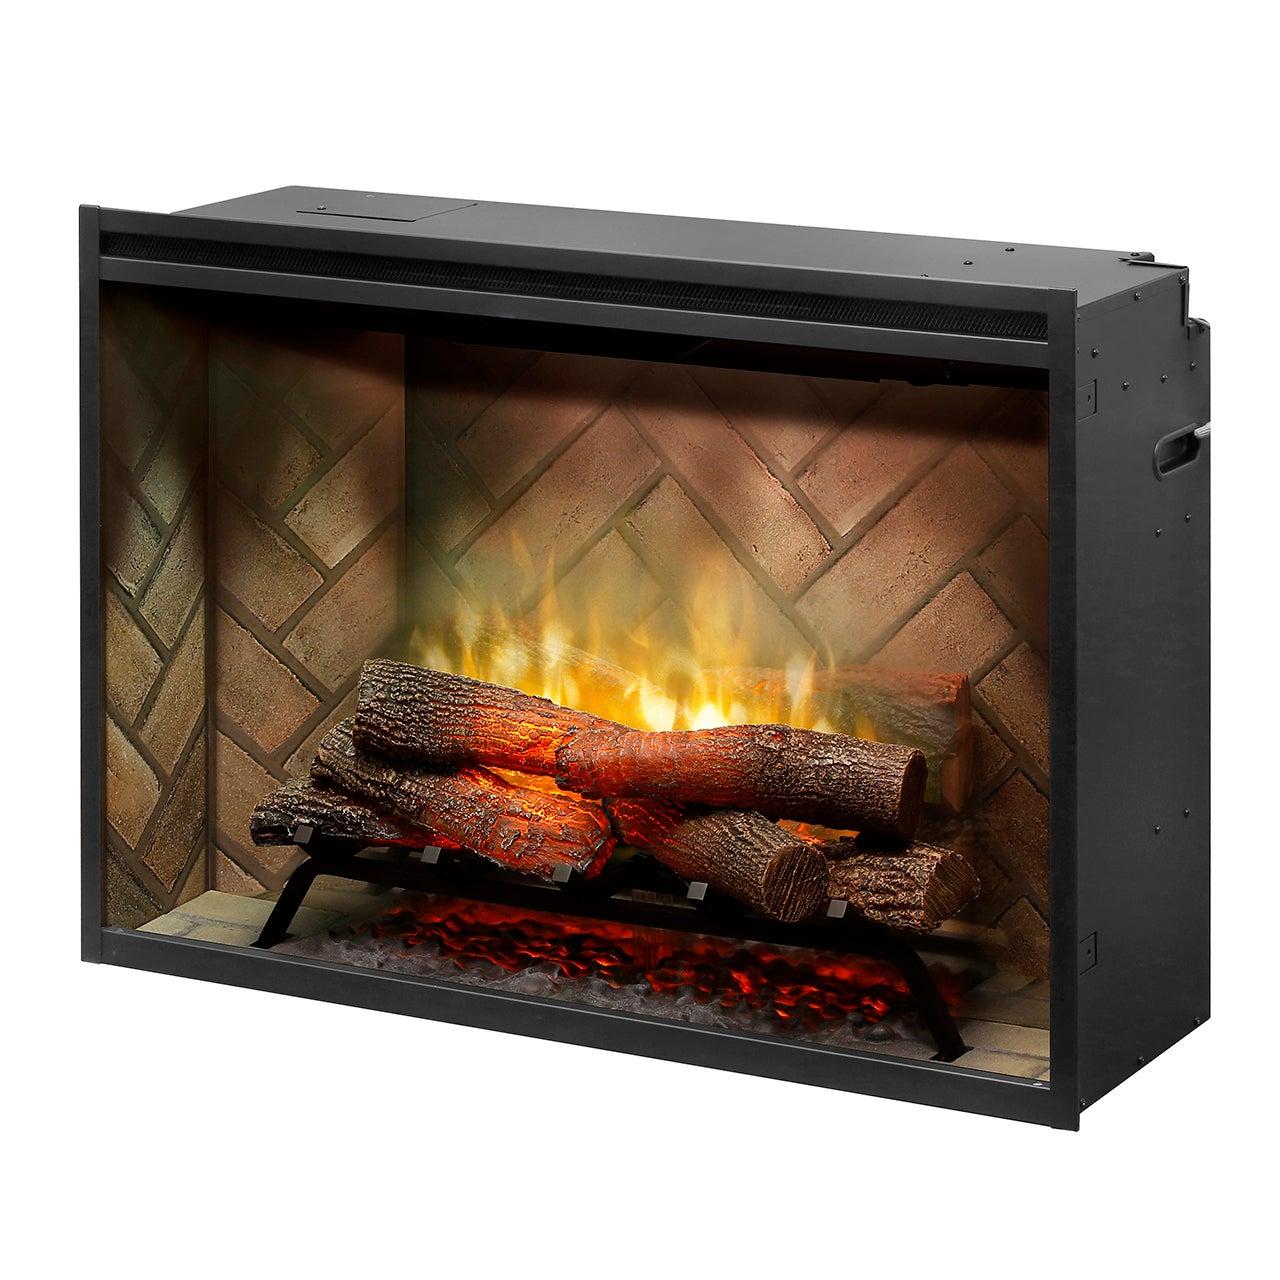 Dimplex RBF36 Heater